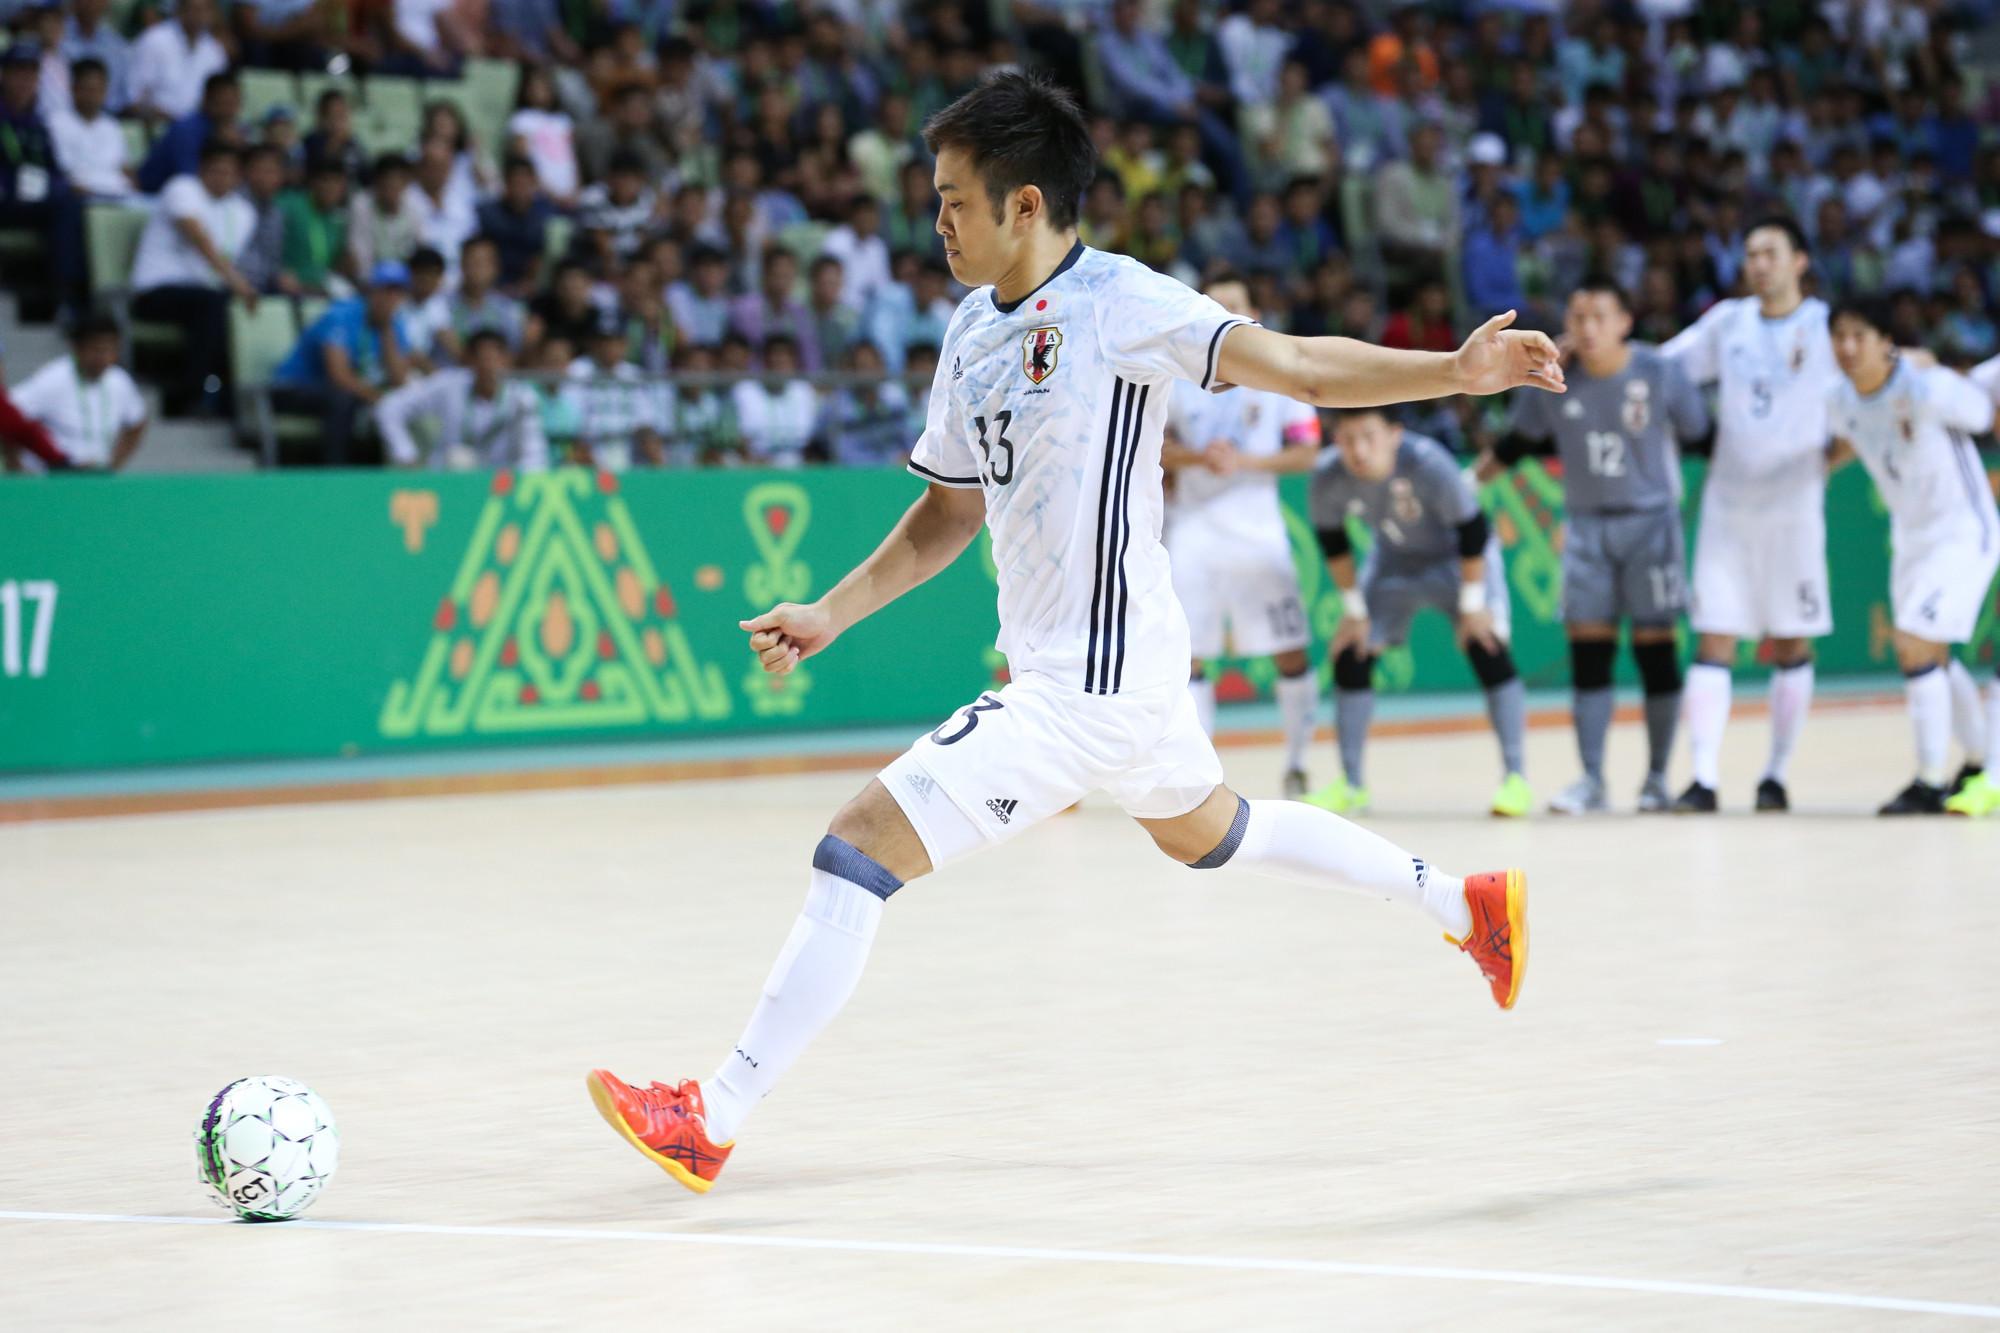 Japan beat Afghanistan on penalties in the bronze medal match ©Ashgabat 2017/Nikita Bassov/Laurel International Management